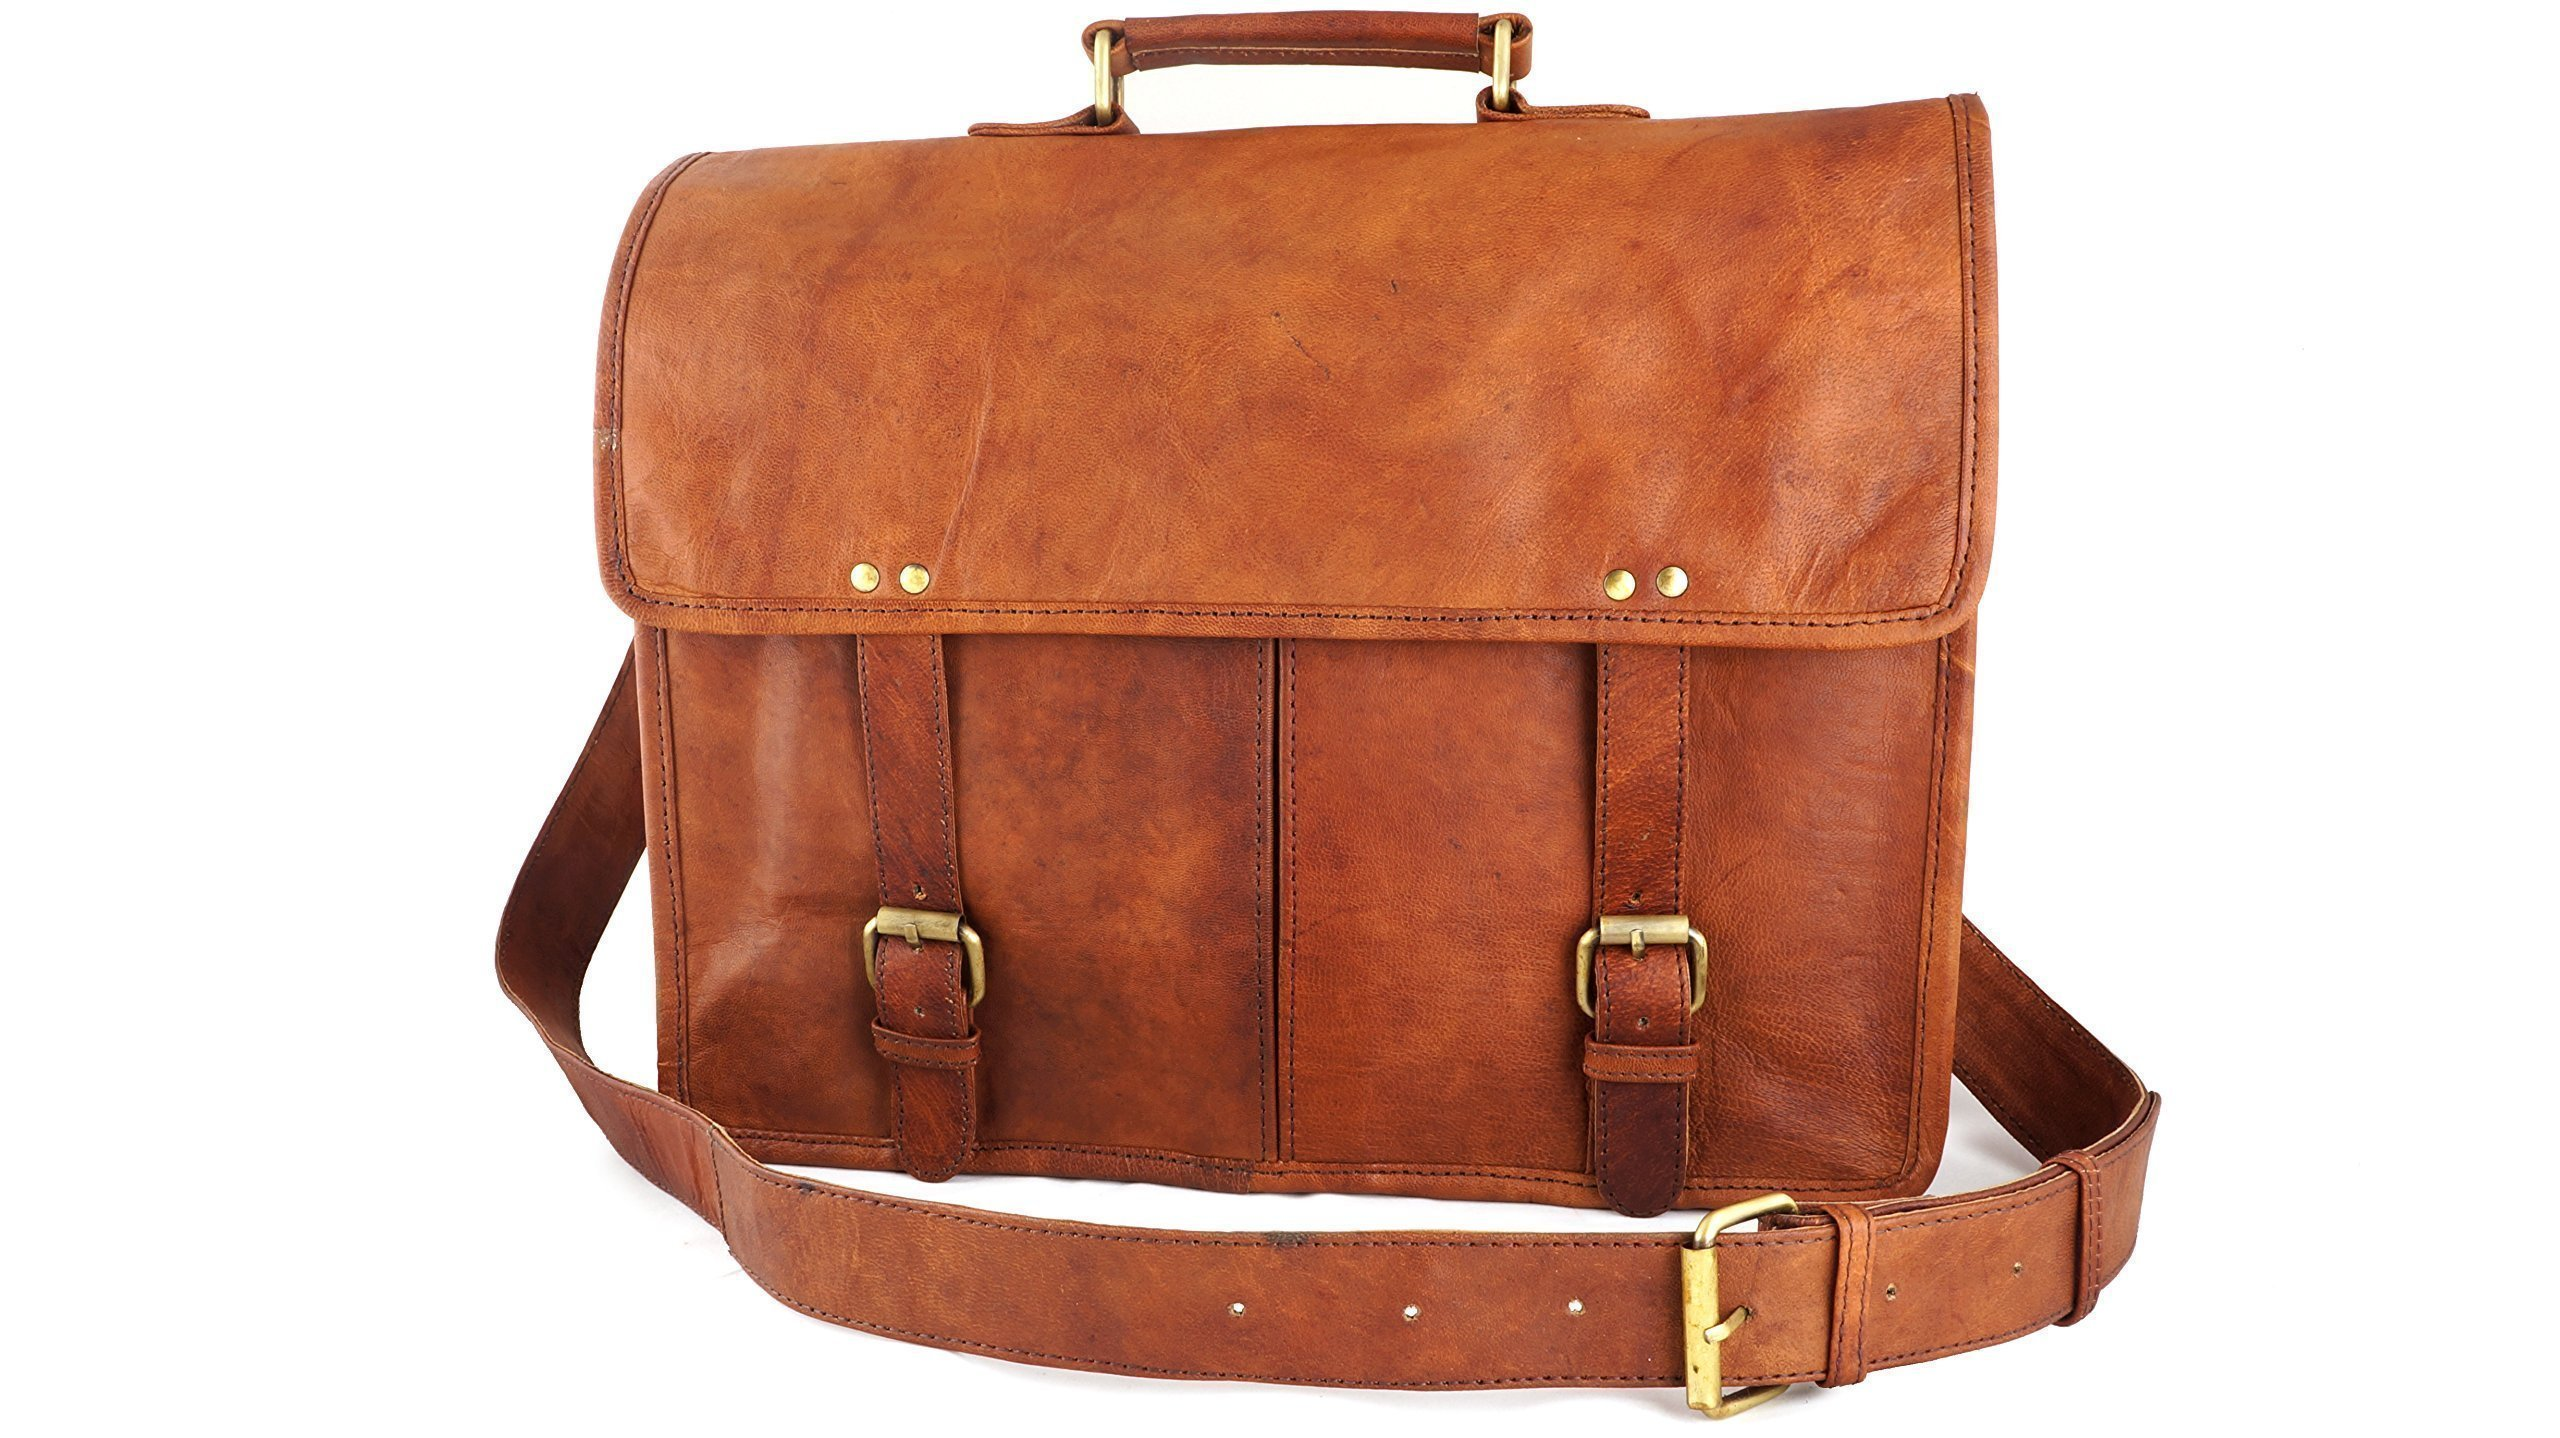 14'' Vintage Rustic Distressed Brown Leather Satchel Messenger Bag for Laptop Old School Style